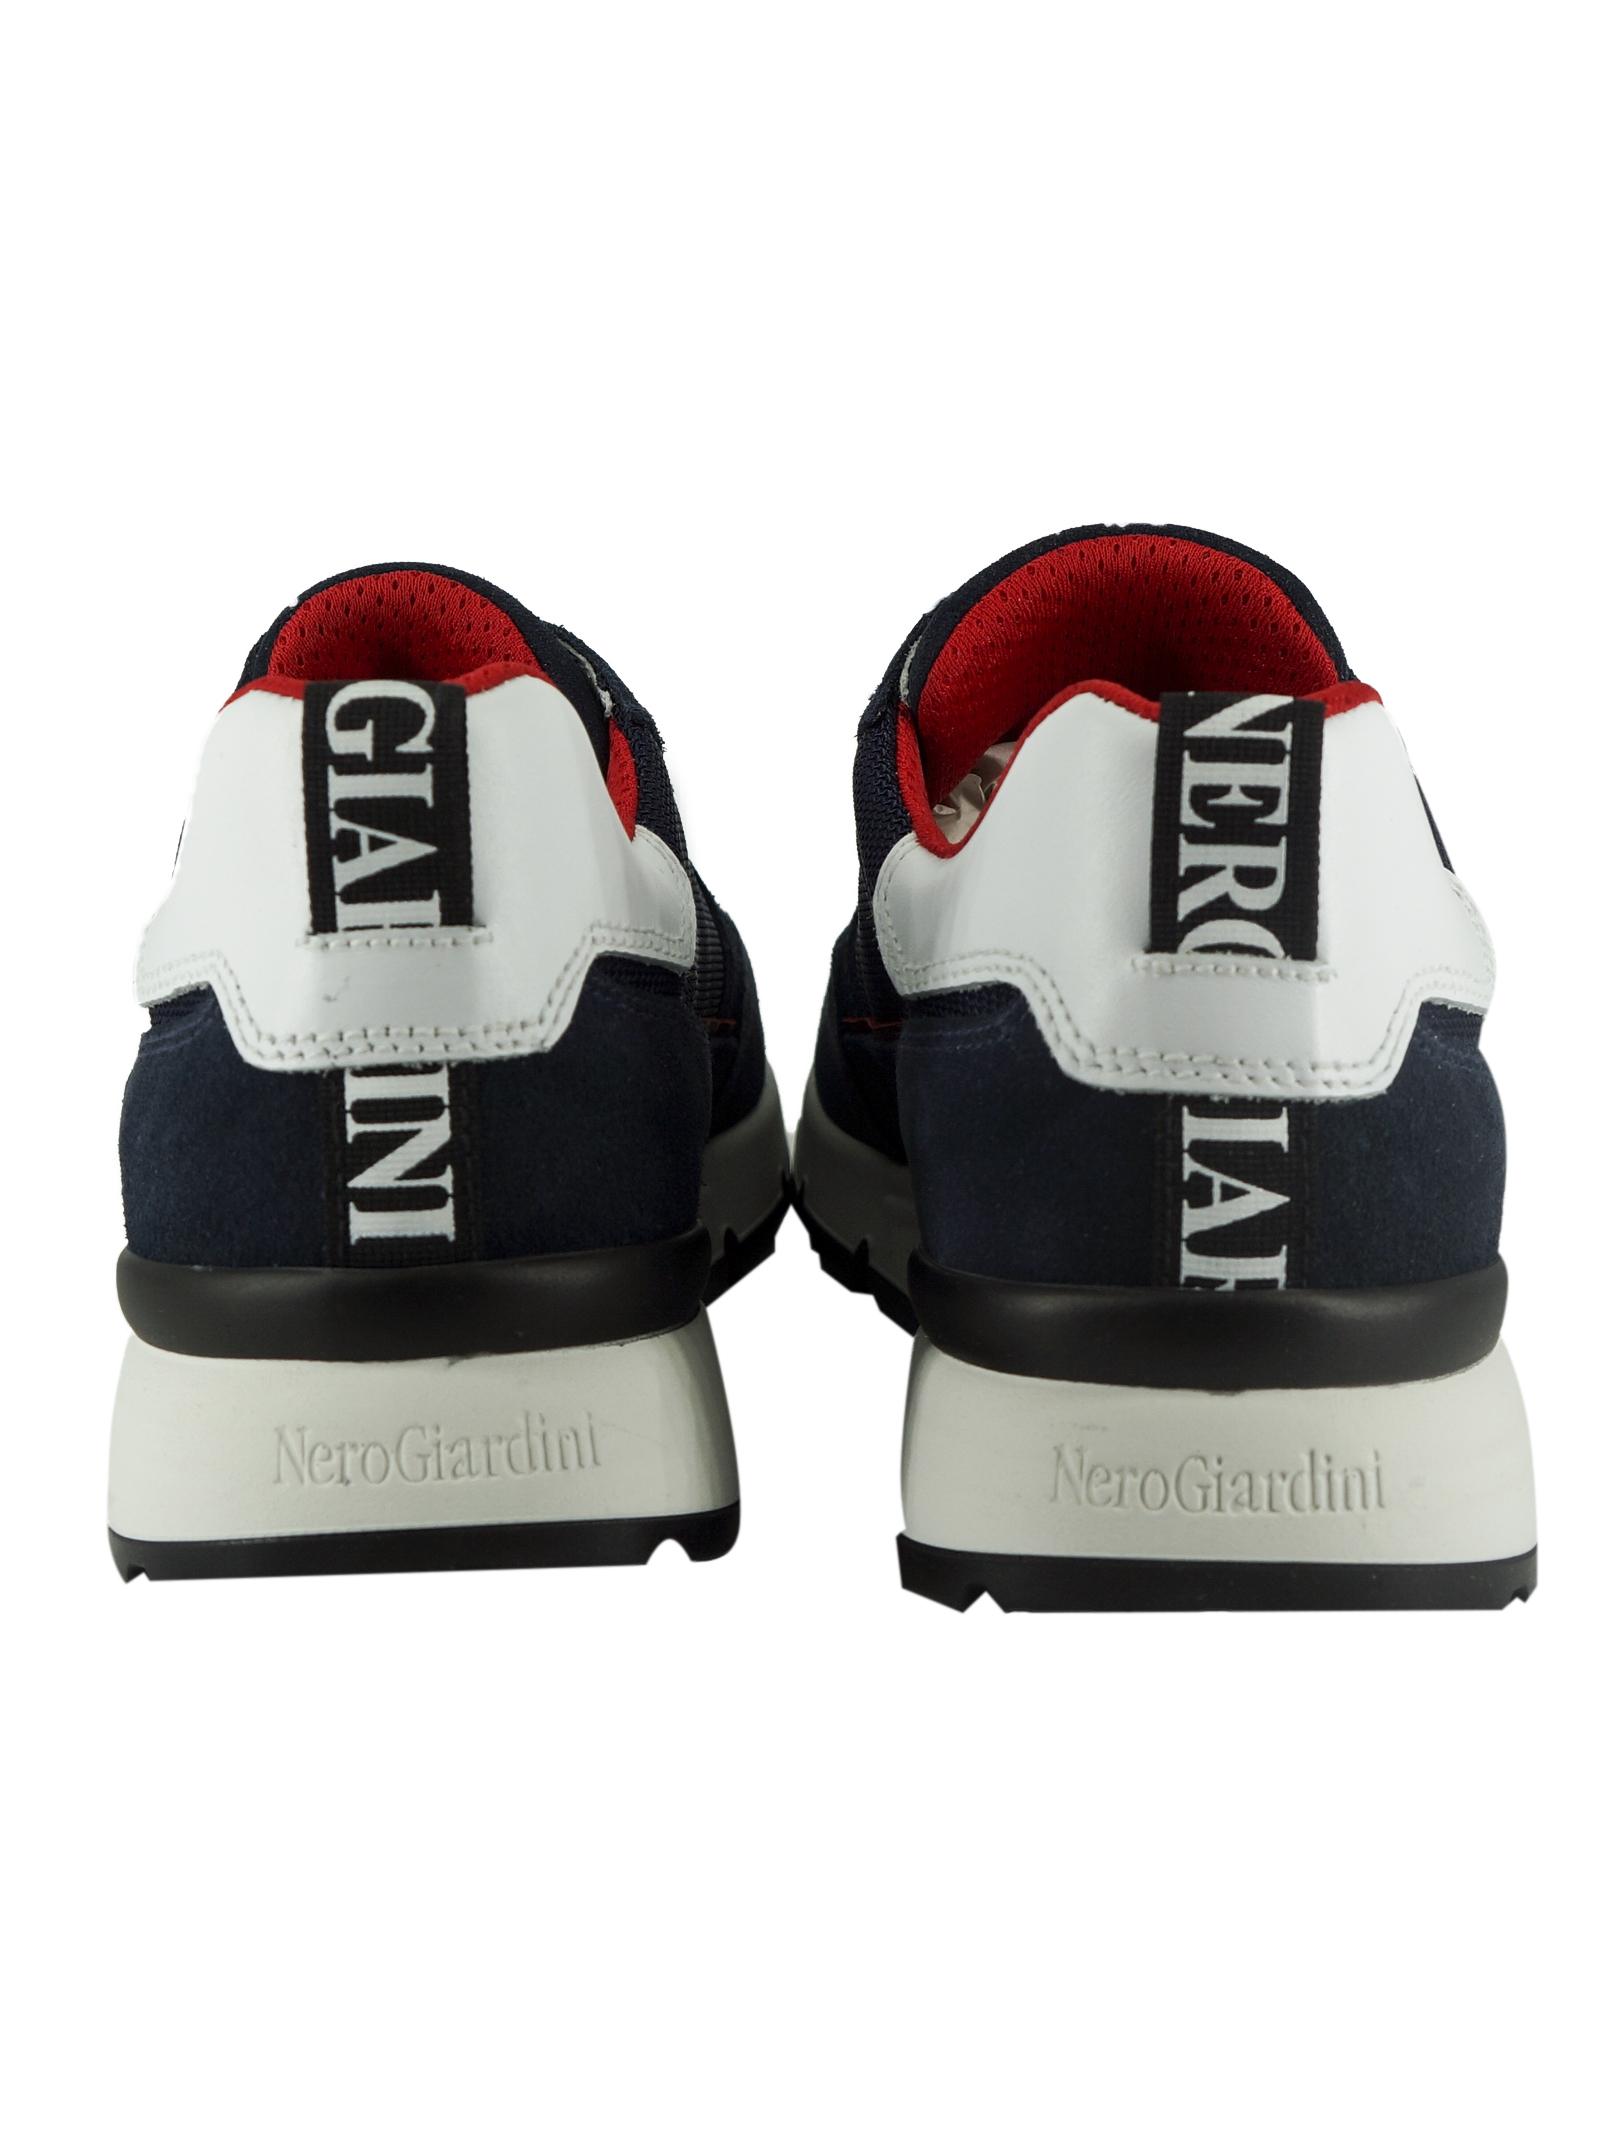 Sneakers Uomo in Camoscio Nero Giardini Nero Giardini | Sneakers | E101990UBLU207